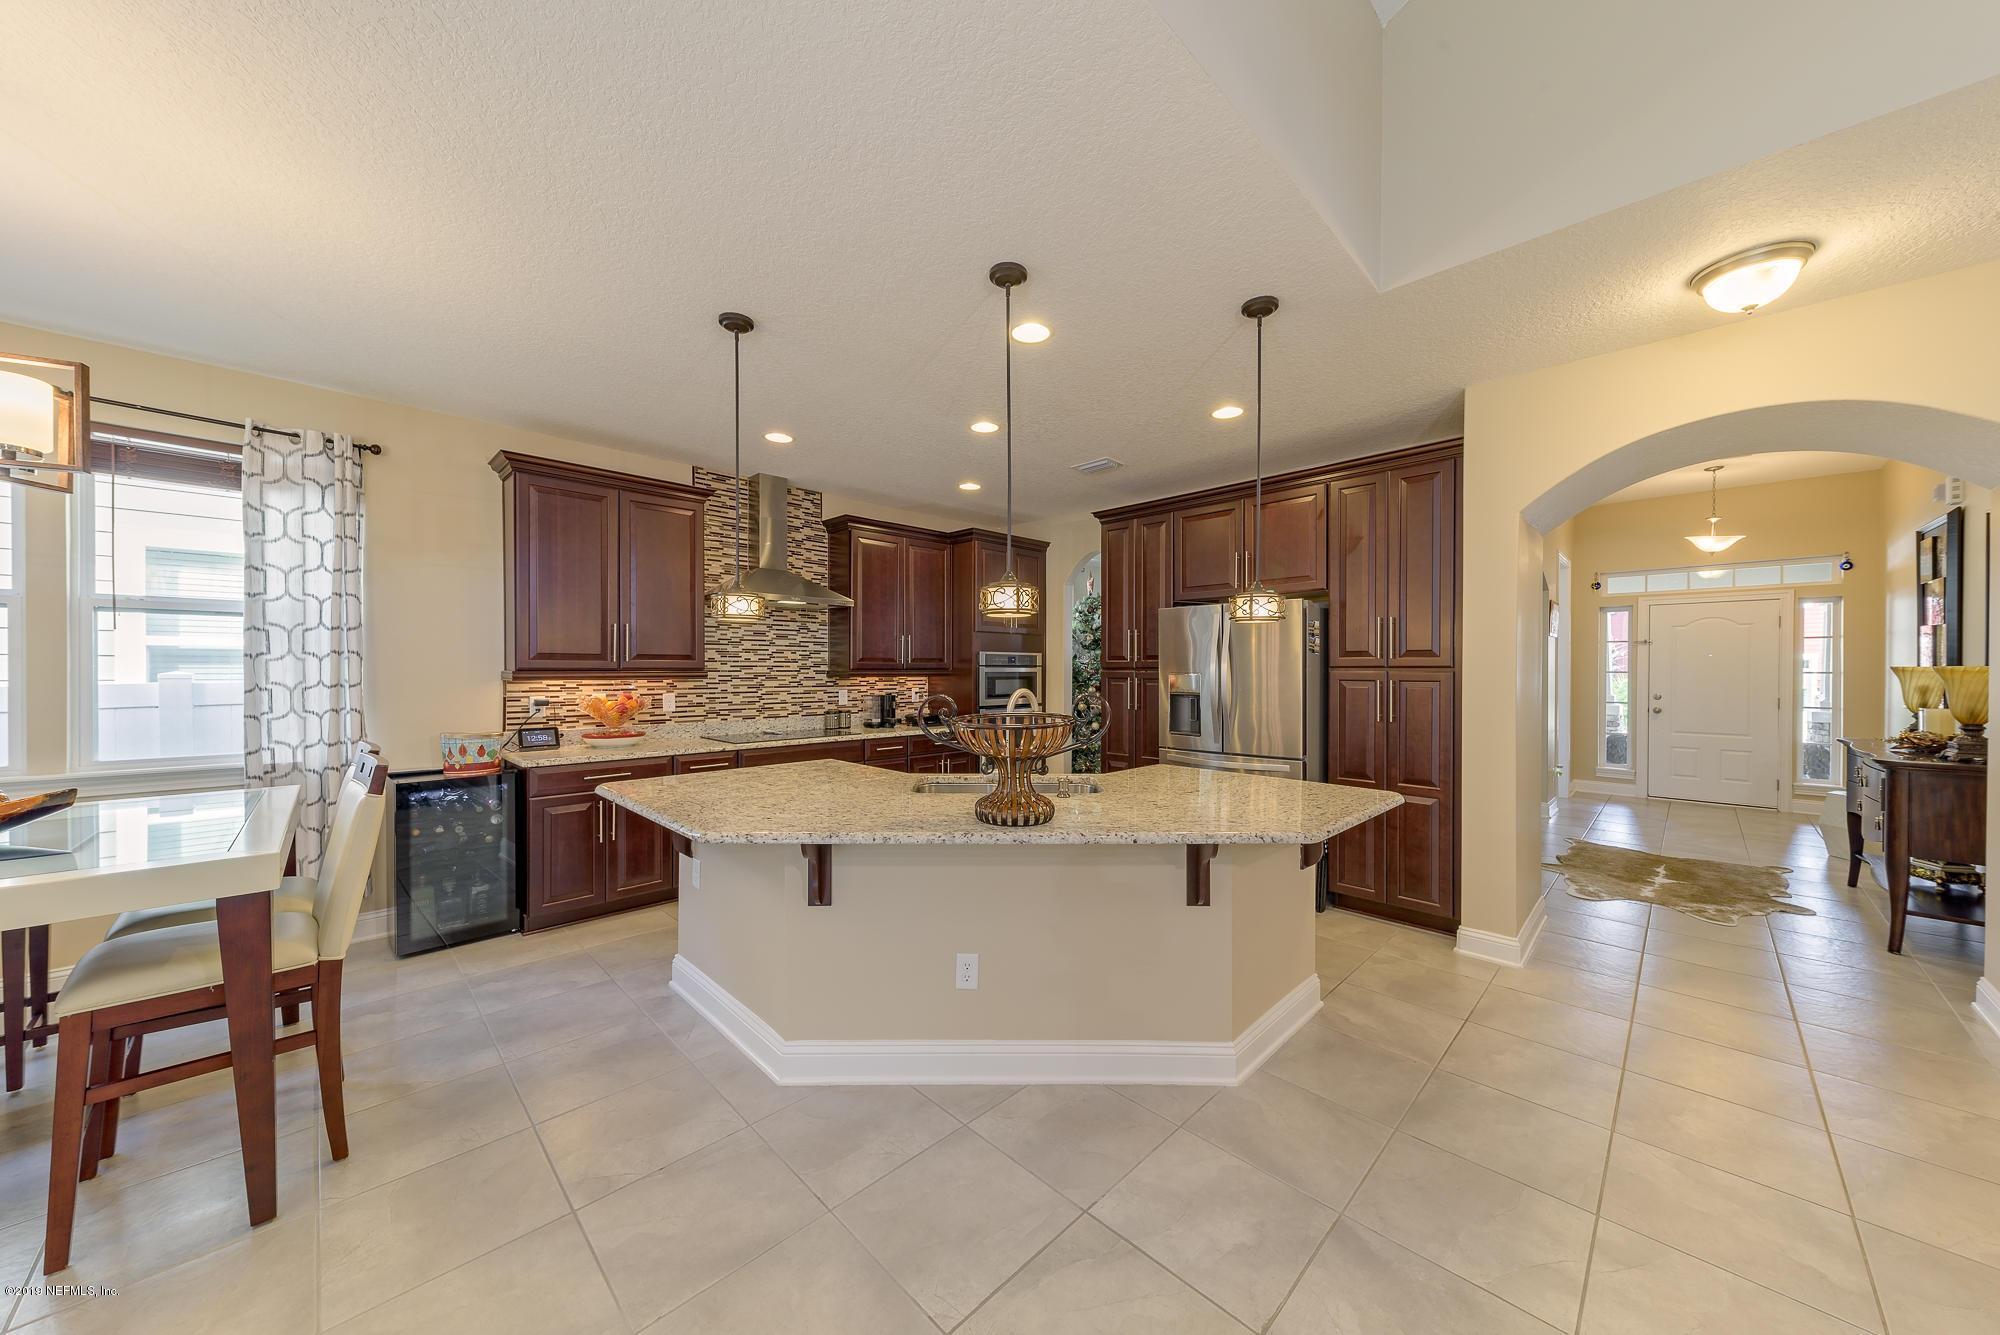 14366 GARDEN GATE, JACKSONVILLE, FLORIDA 32258, 5 Bedrooms Bedrooms, ,4 BathroomsBathrooms,Residential - single family,For sale,GARDEN GATE,974112